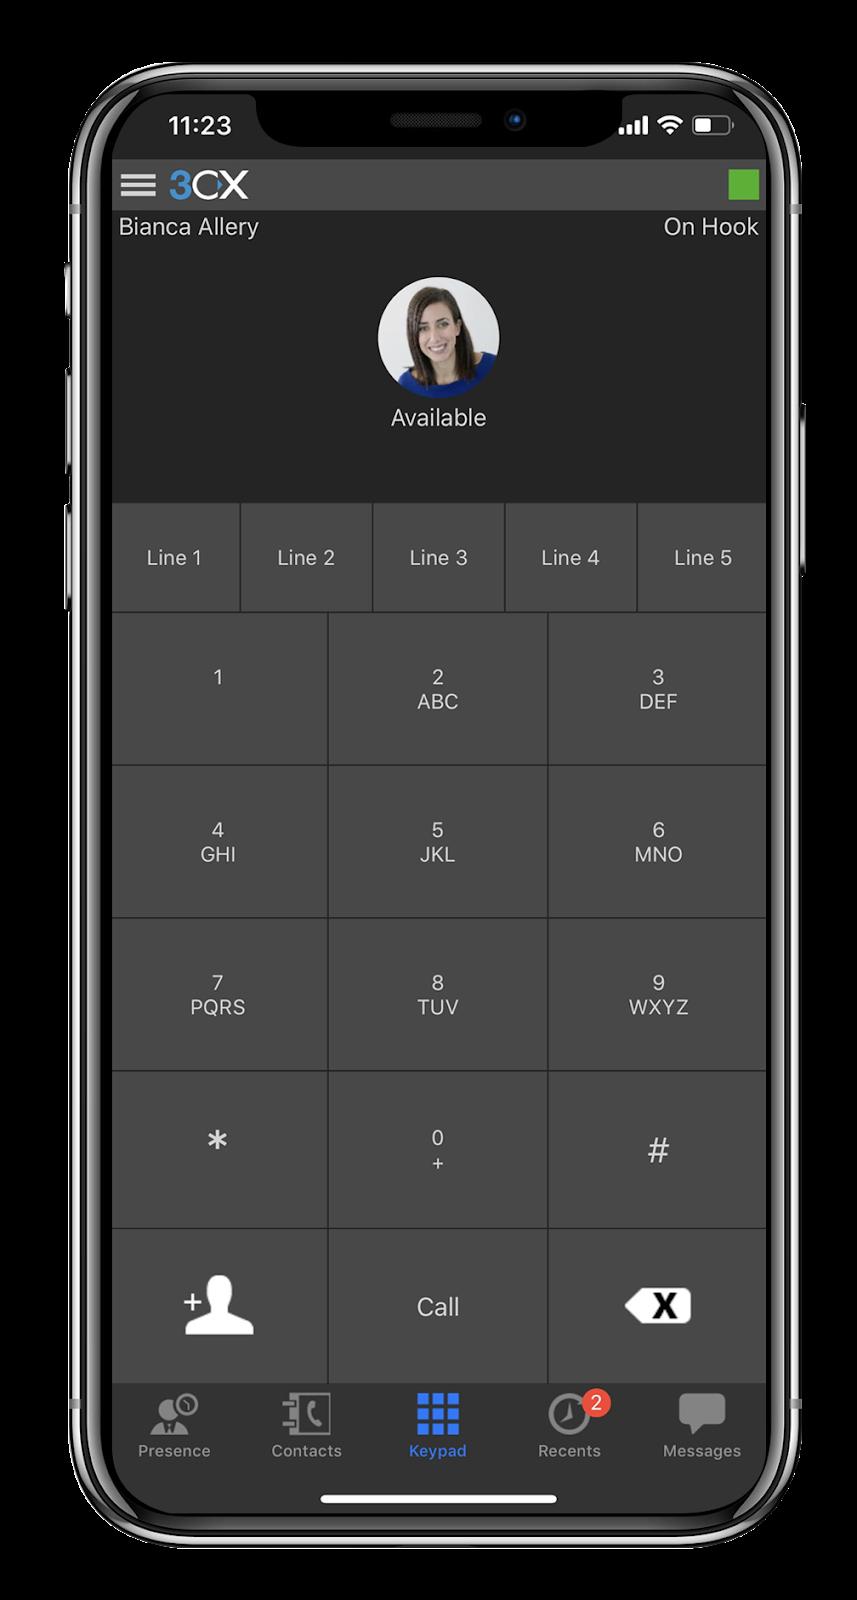 3CX App für iOS auf dem iPhone 6